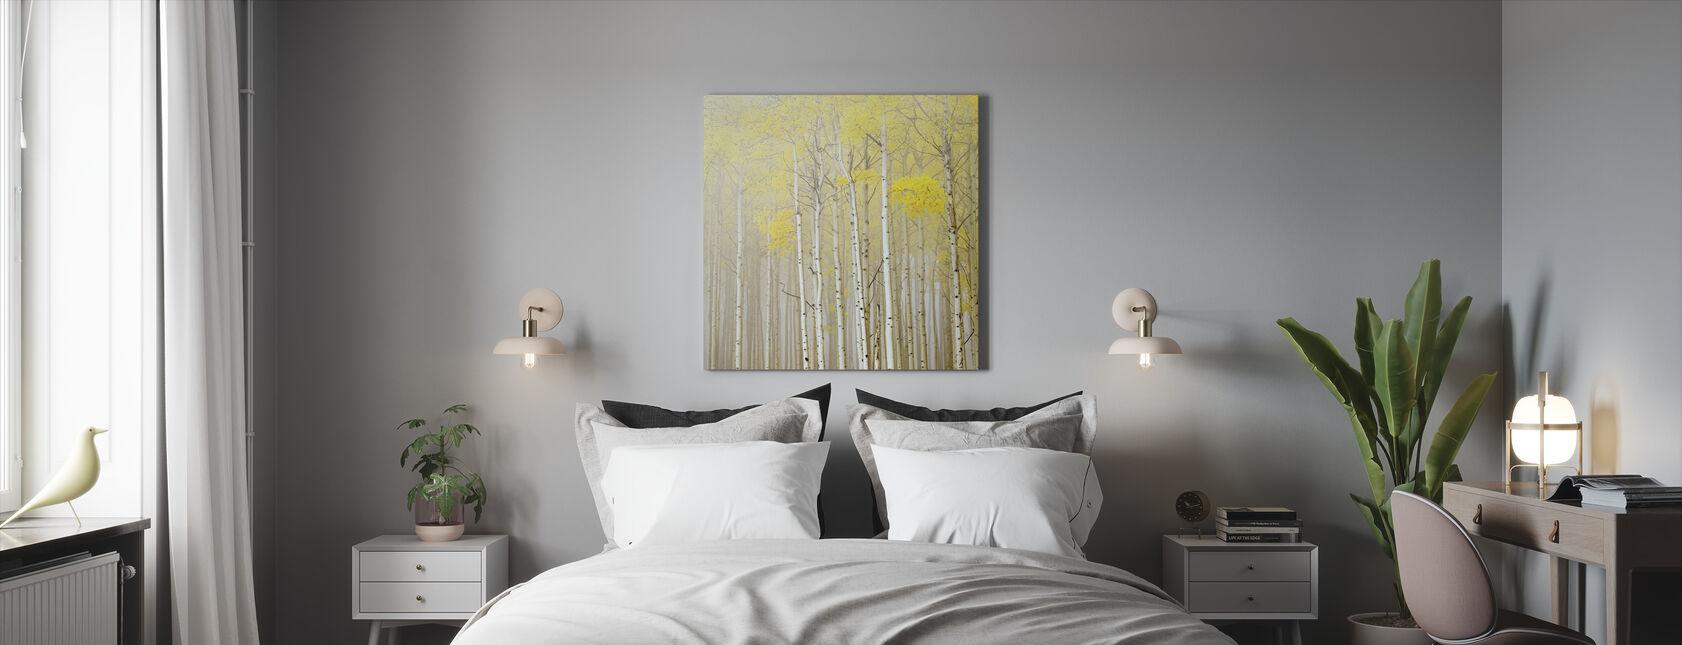 Aspens sumussa - Canvastaulu - Makuuhuone